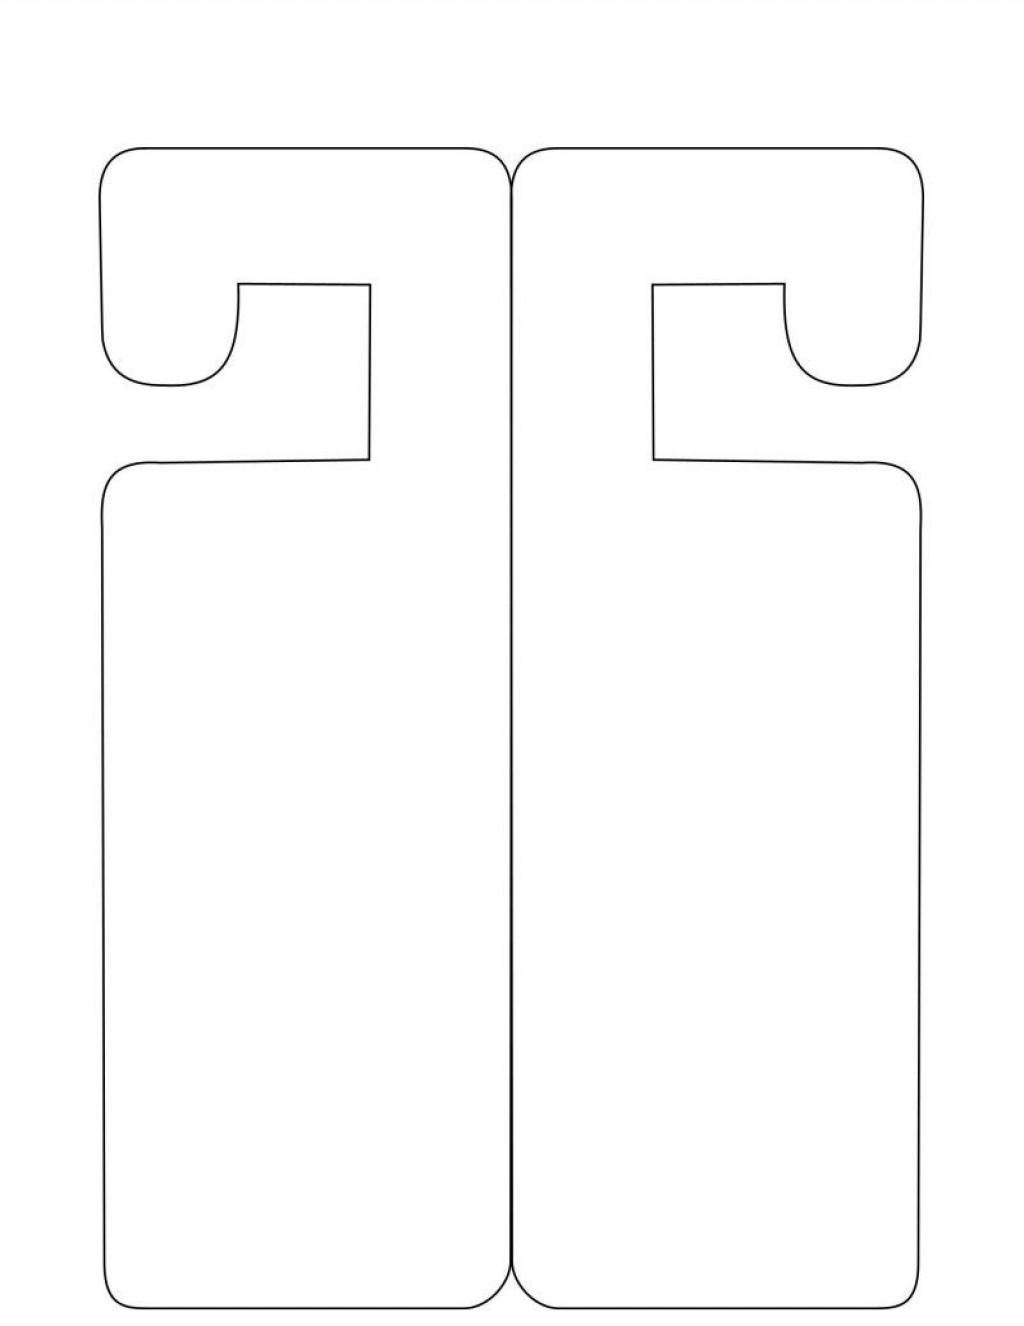 007 Singular Free Printable Door Hanger Template High Def  Templates Wedding EditableLarge